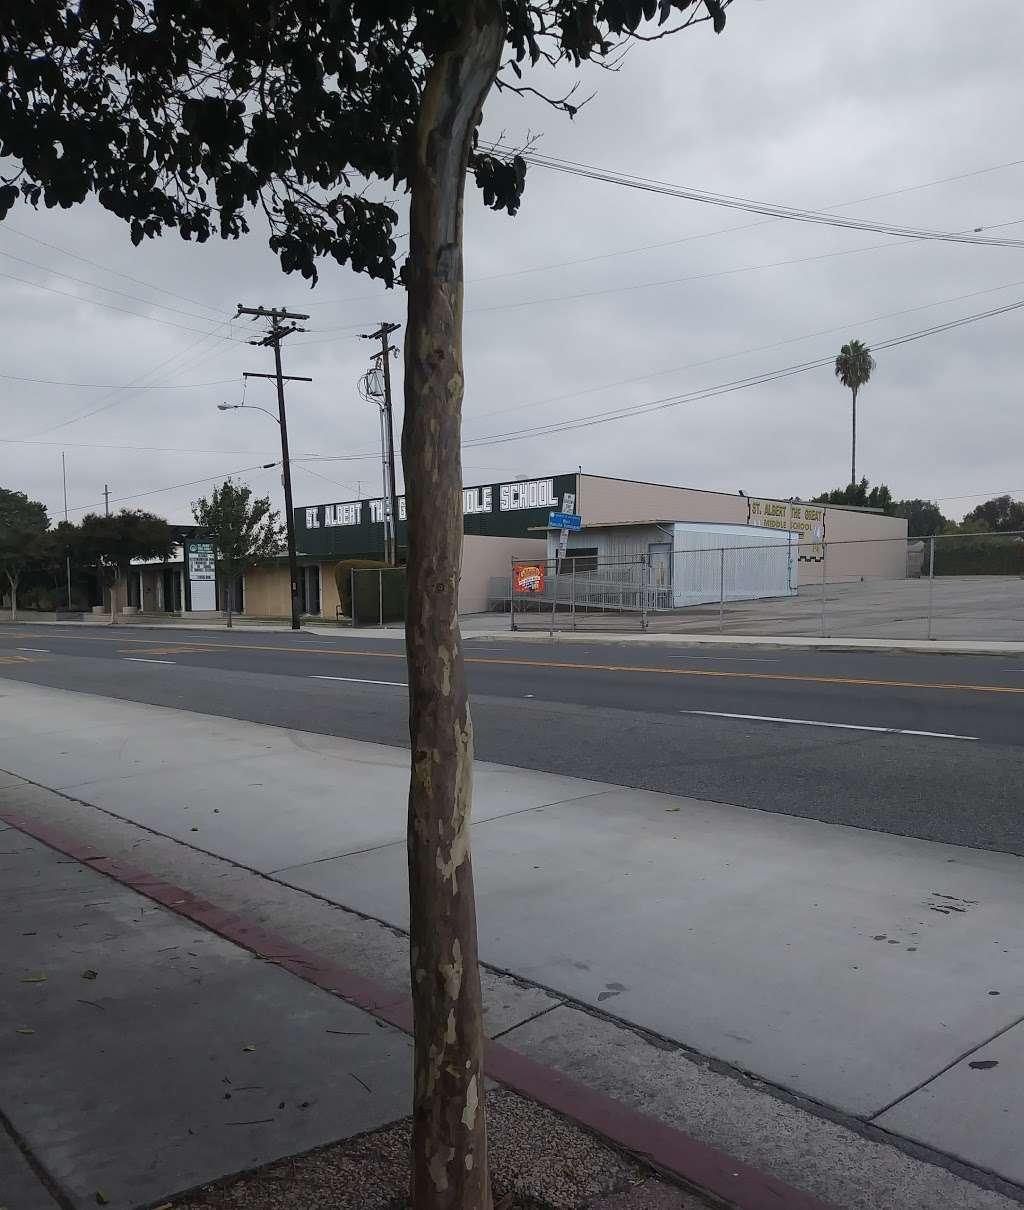 St Albert the Great School - school    Photo 2 of 7   Address: 804 E Compton Blvd, Rancho Dominguez, CA 90220, USA   Phone: (310) 323-4559